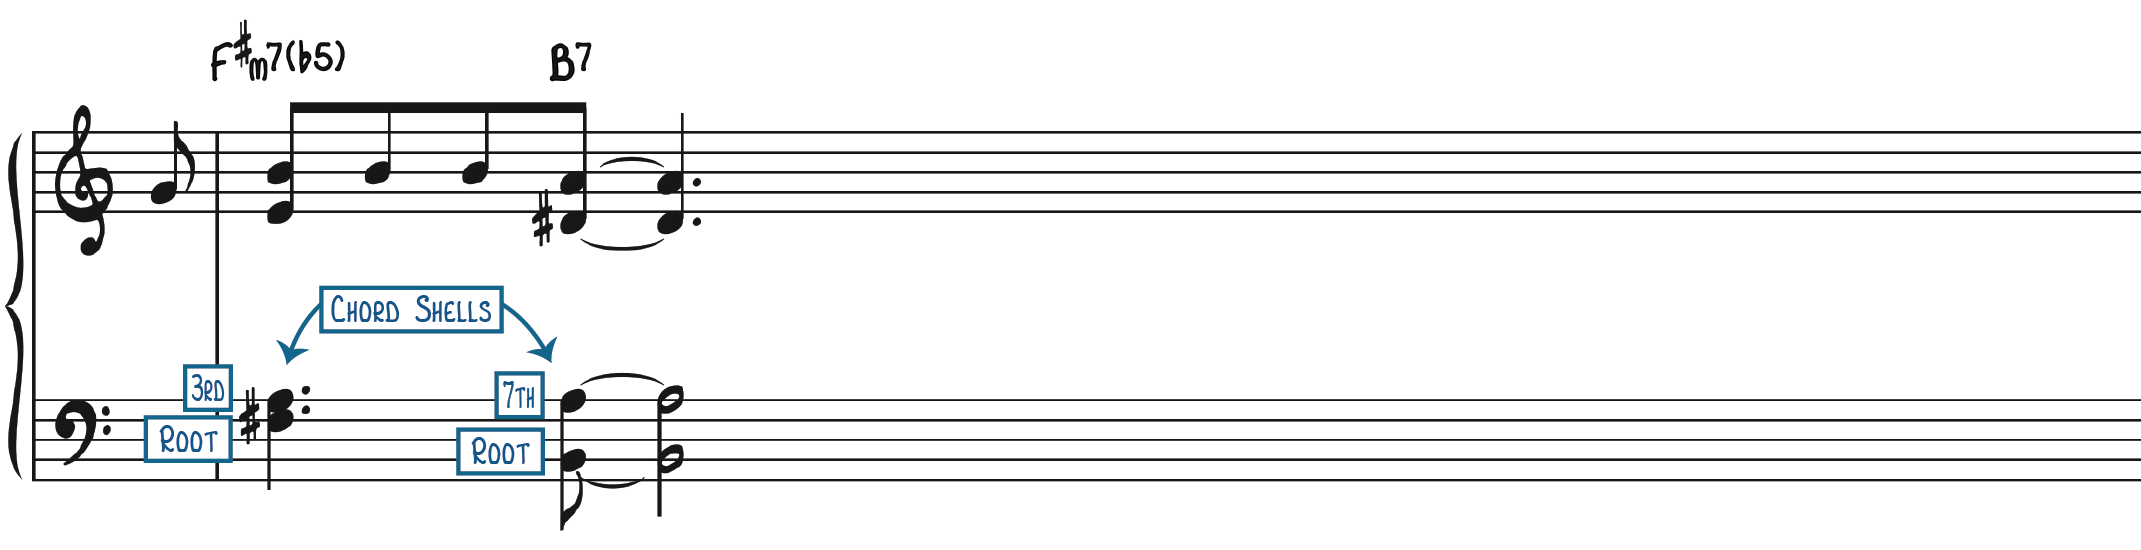 Jazz Swing Piano Accompaniment with Chord Shells Winter Wonderland